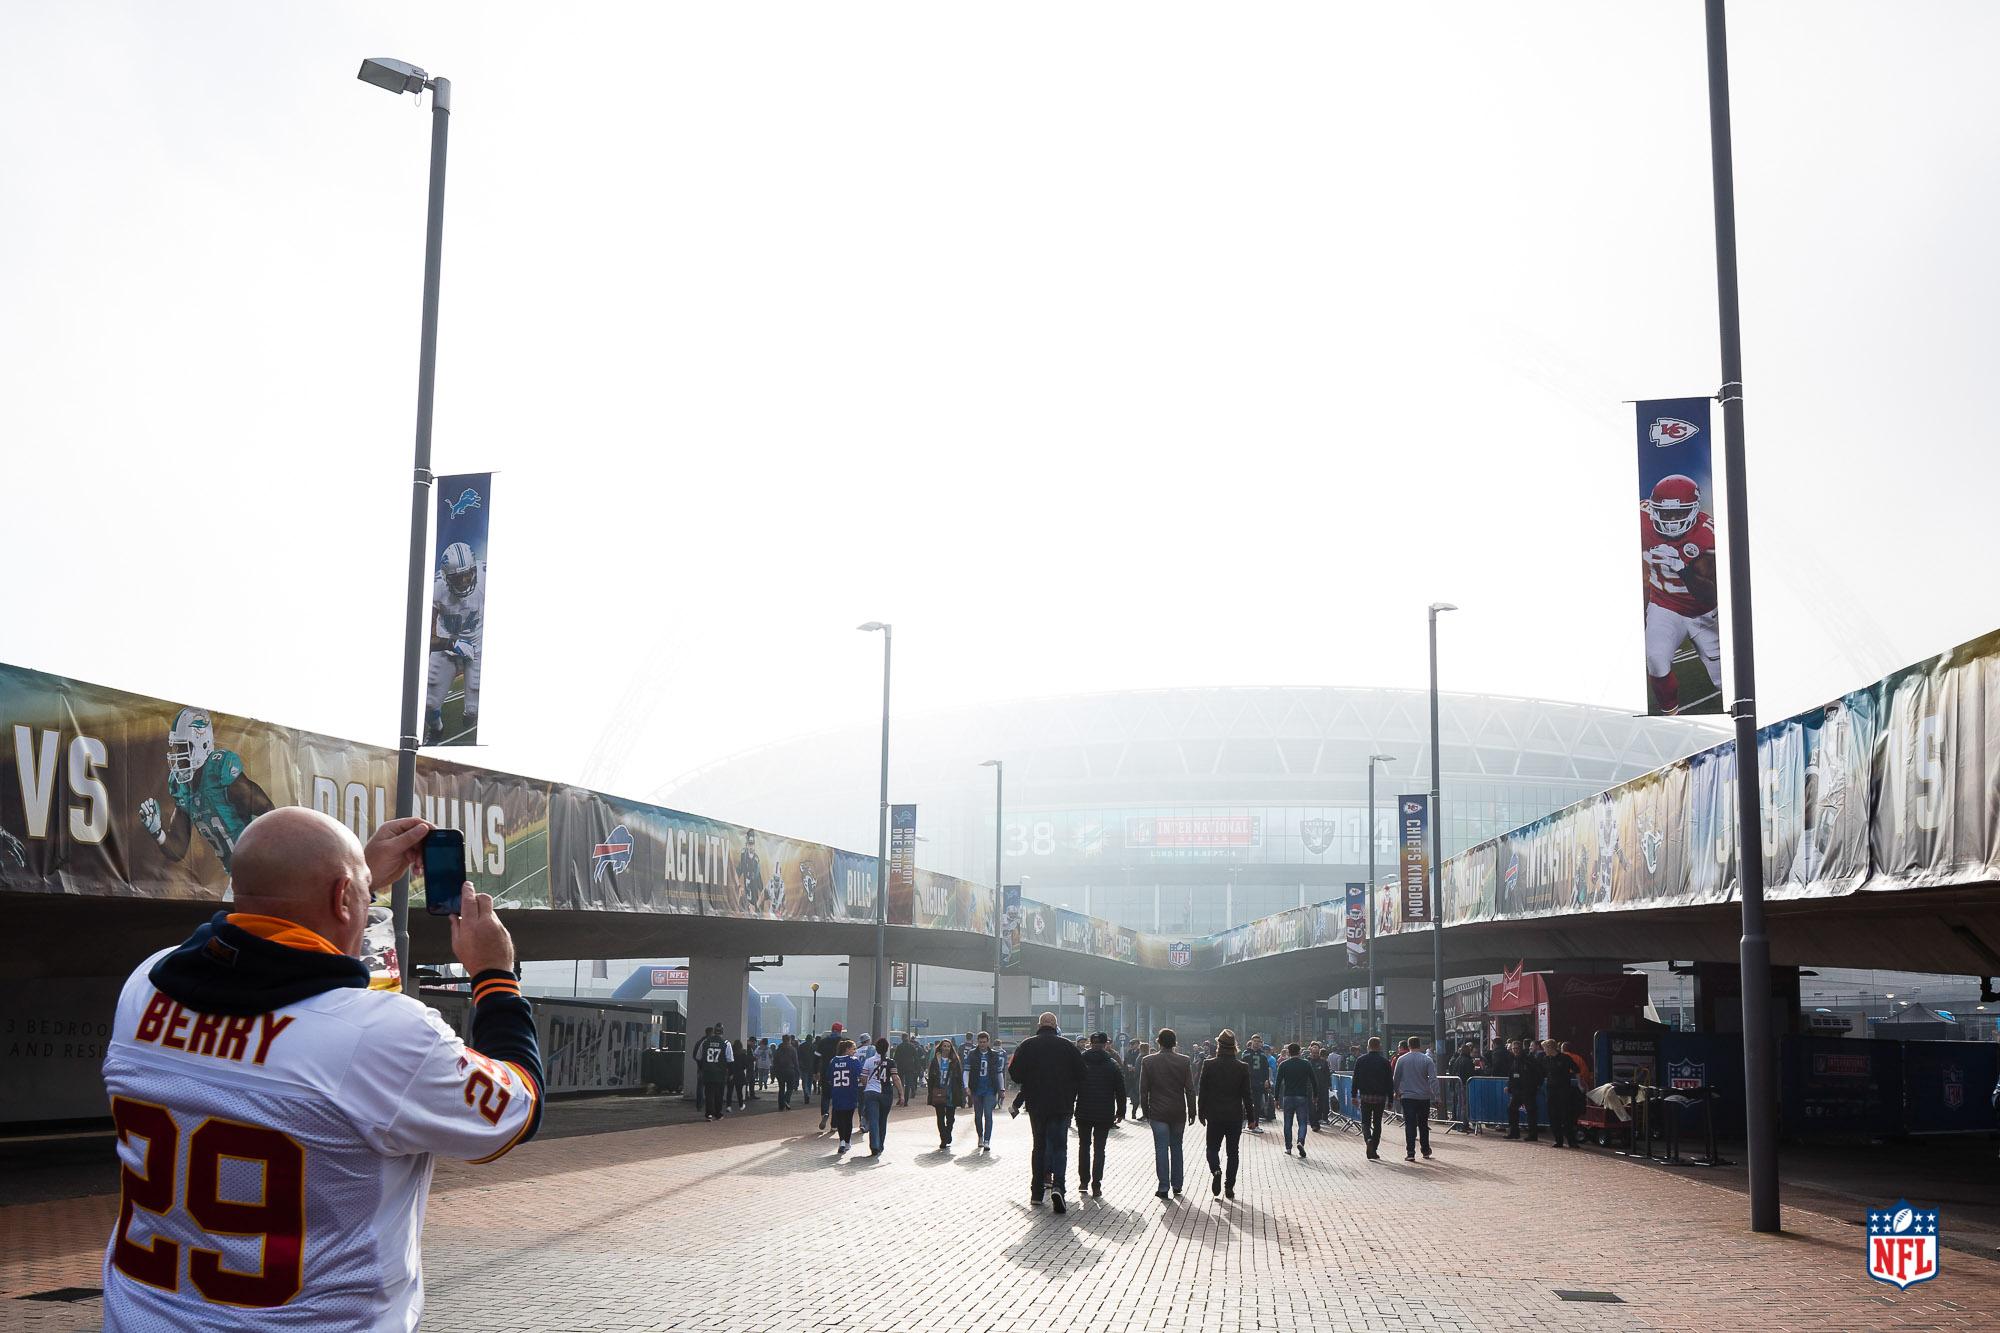 014_151101_London_Game_14_Wembley_0538016.jpg